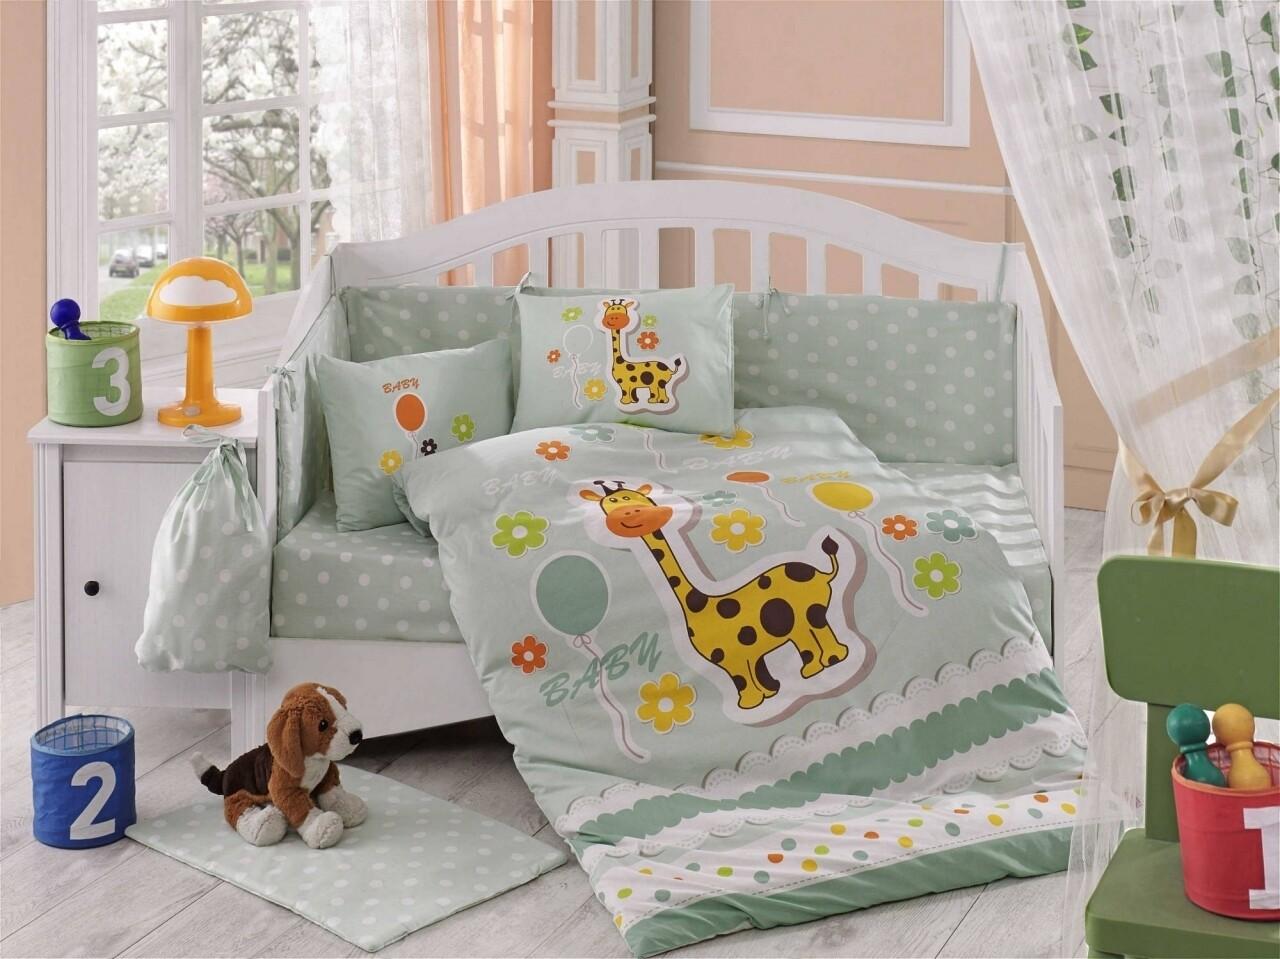 Lenjerie de pat pentru copii, 4 piese, 100% bumbac poplin, Hobby, Puffy, verde